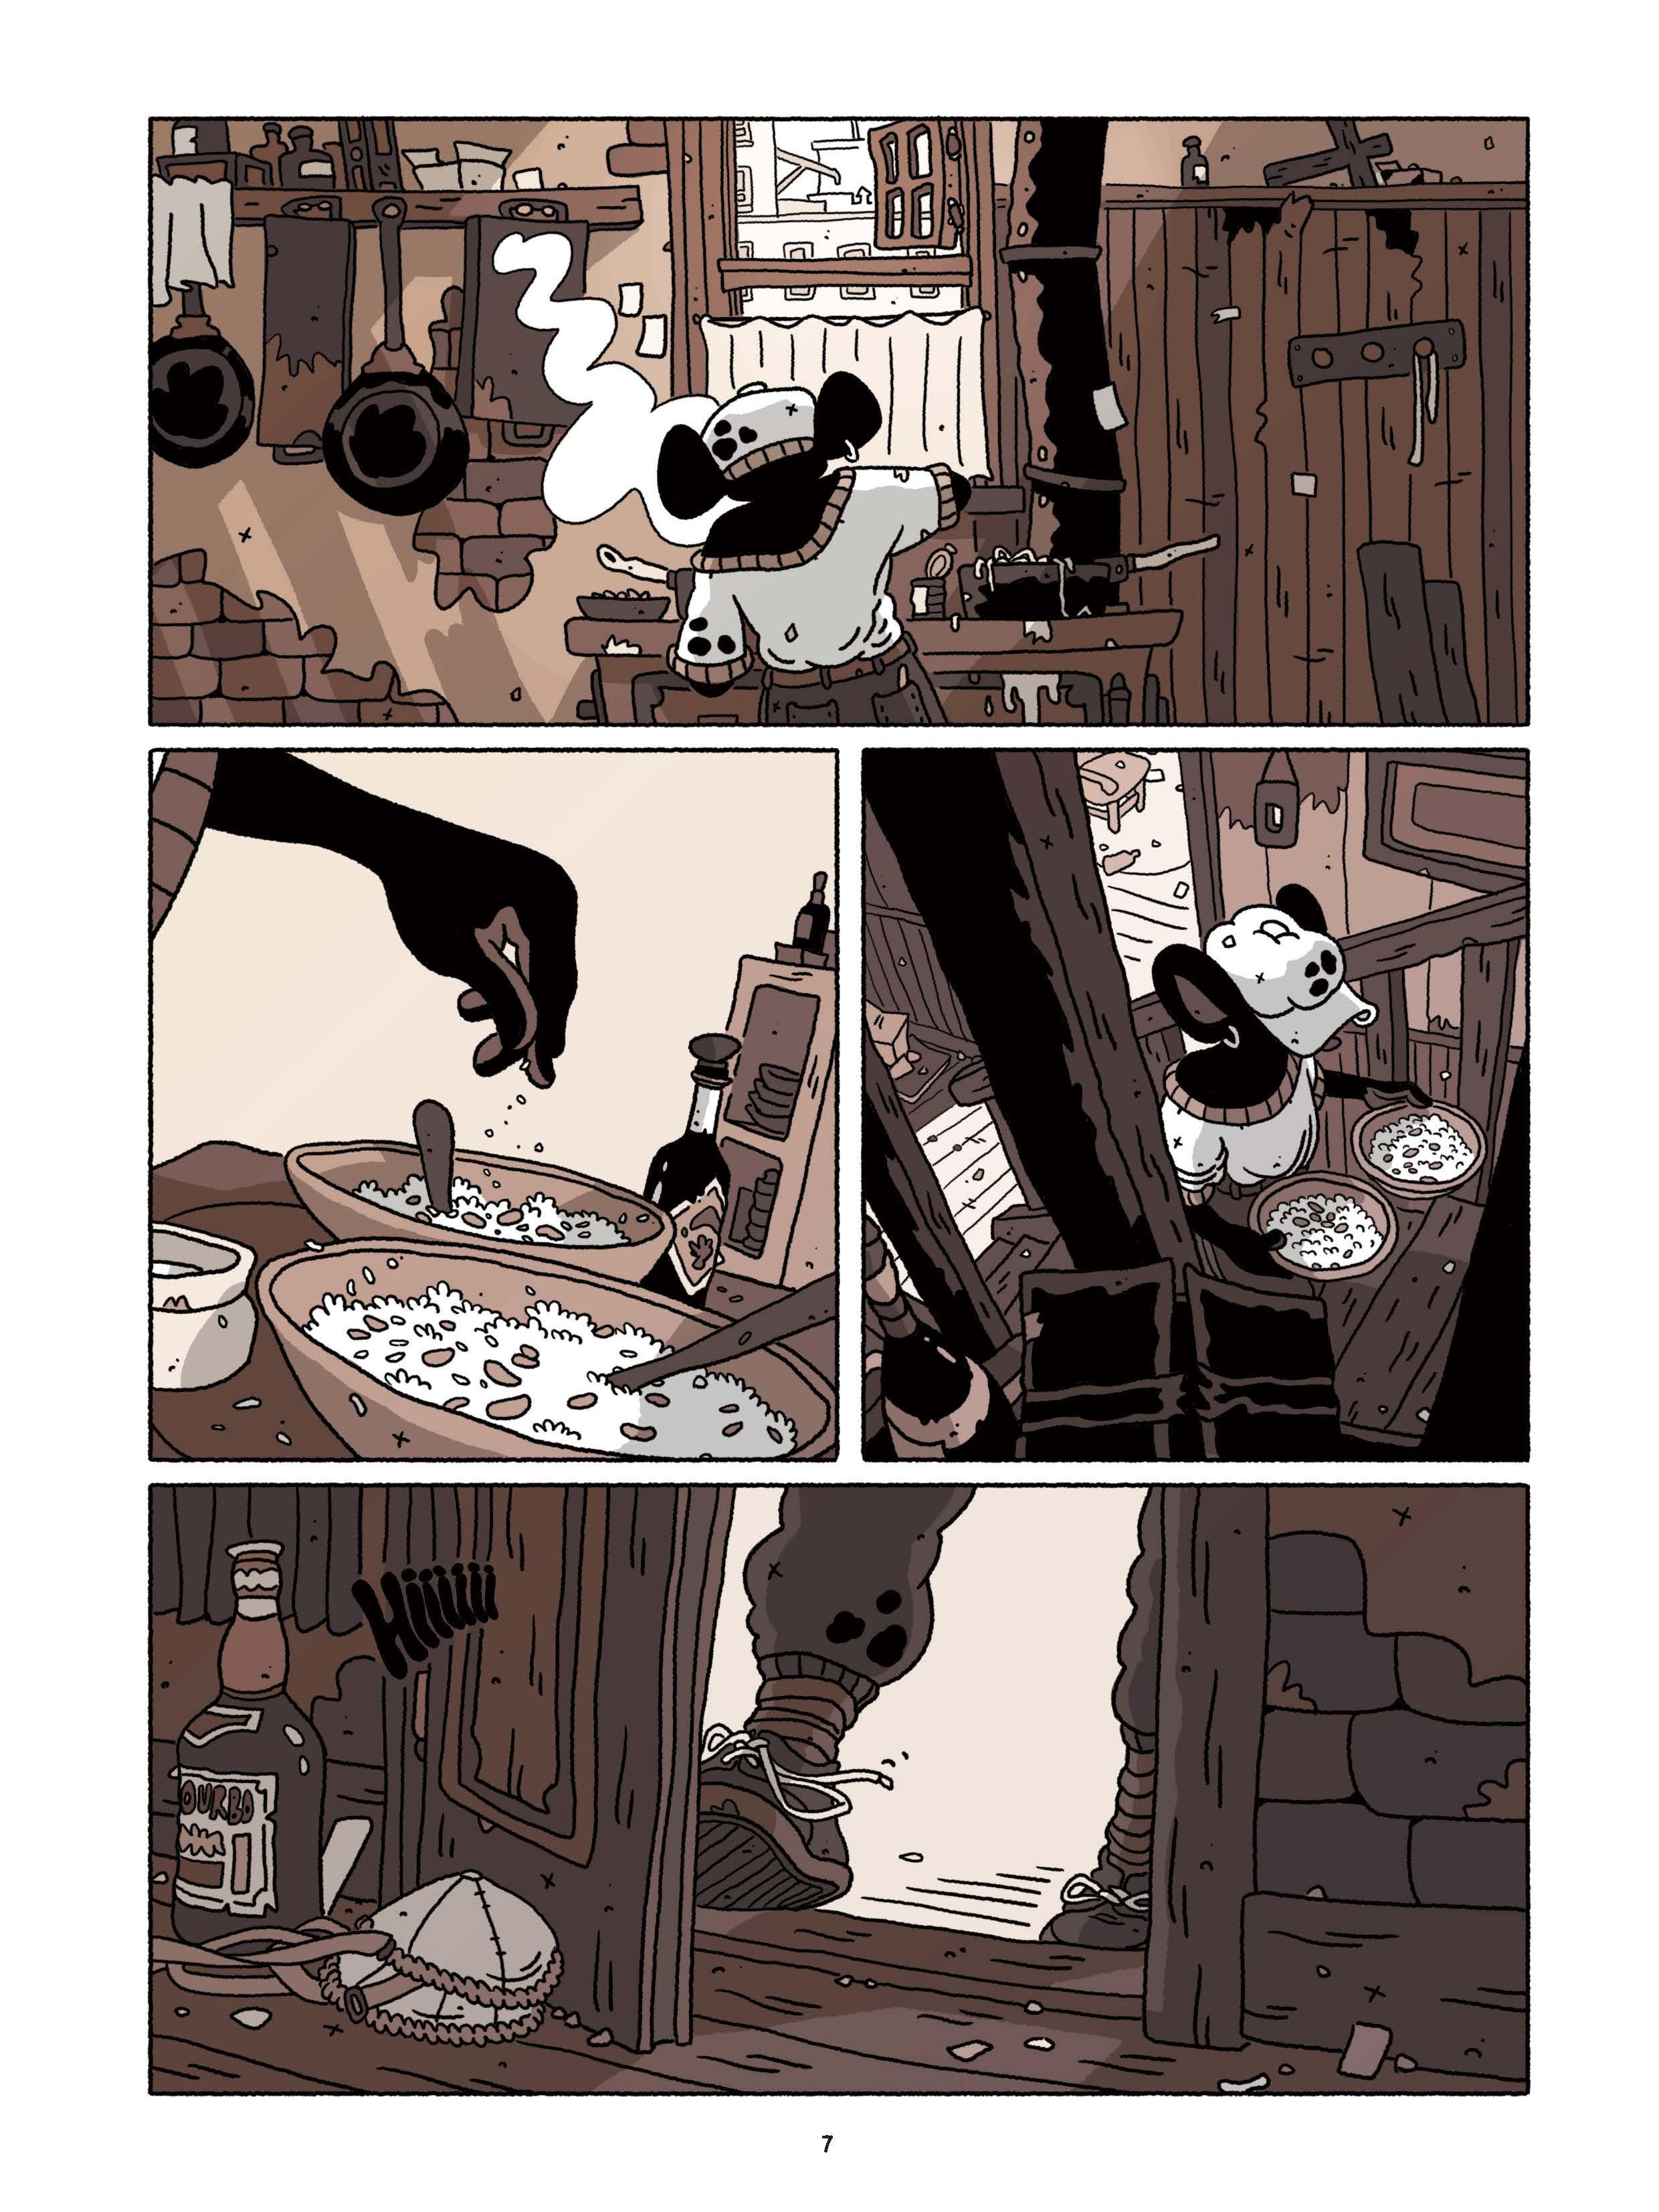 Extrait n°2 par Leo Heitz